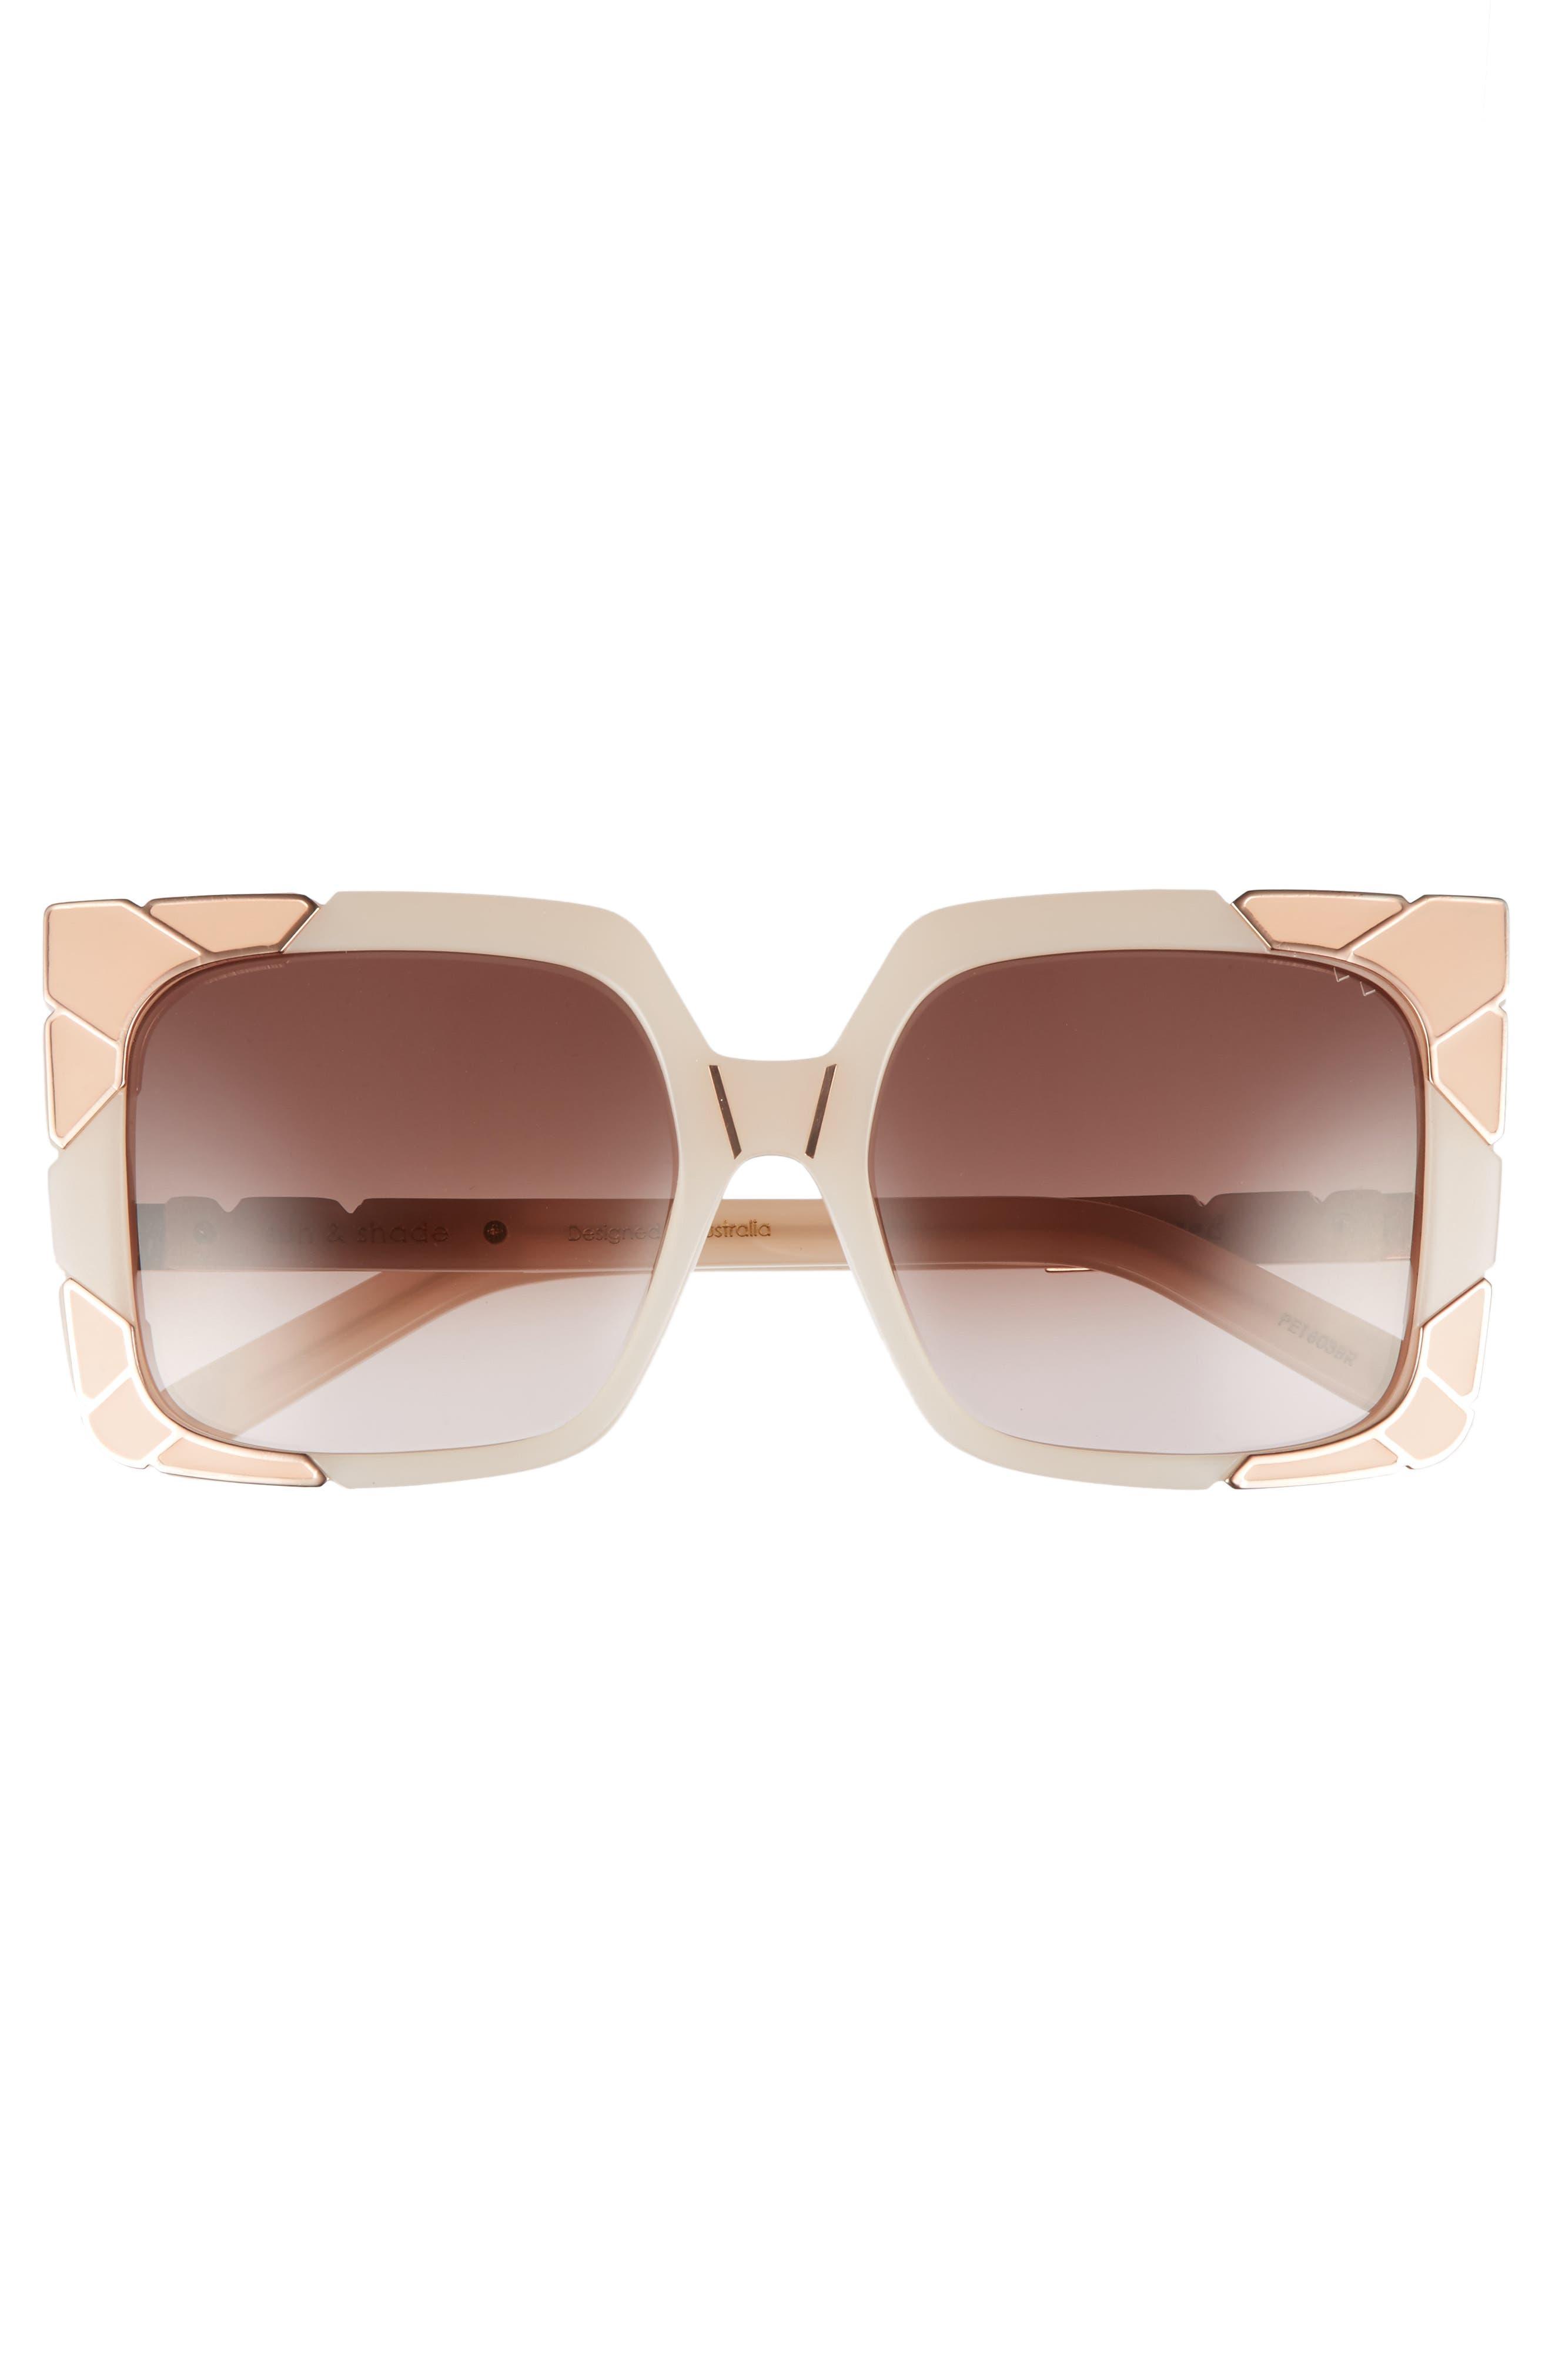 Sun & Shade 55mm Square Retro Sunglasses,                             Alternate thumbnail 3, color,                             Blush/ Rose Gold/ Brown